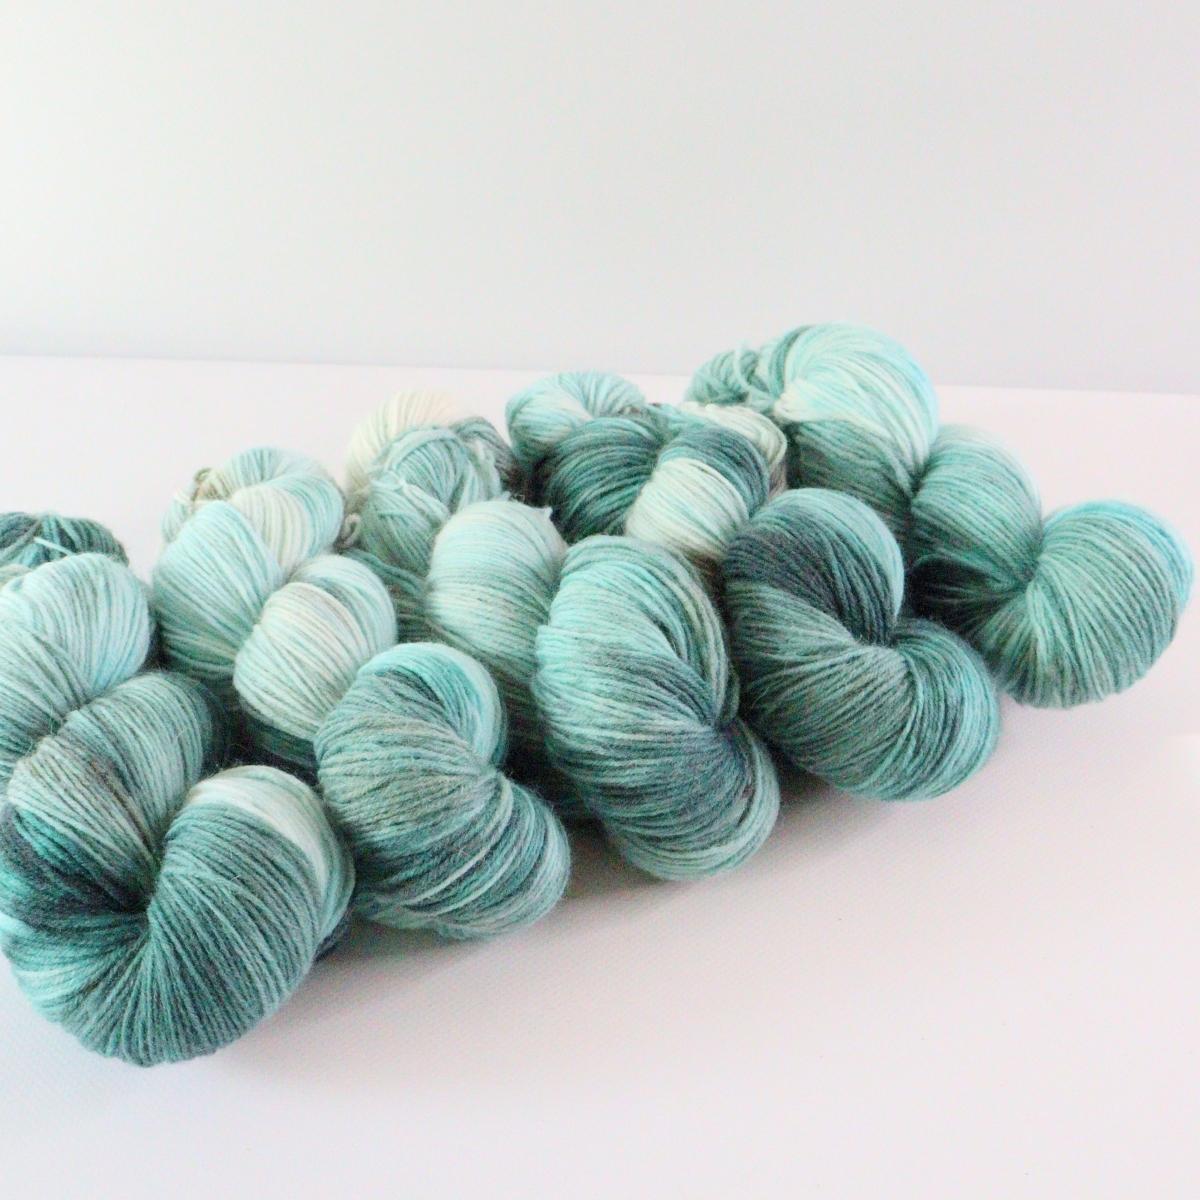 woodico.pro hand dyed yarn 074 1200x1200 - Hand dyed yarn / 074